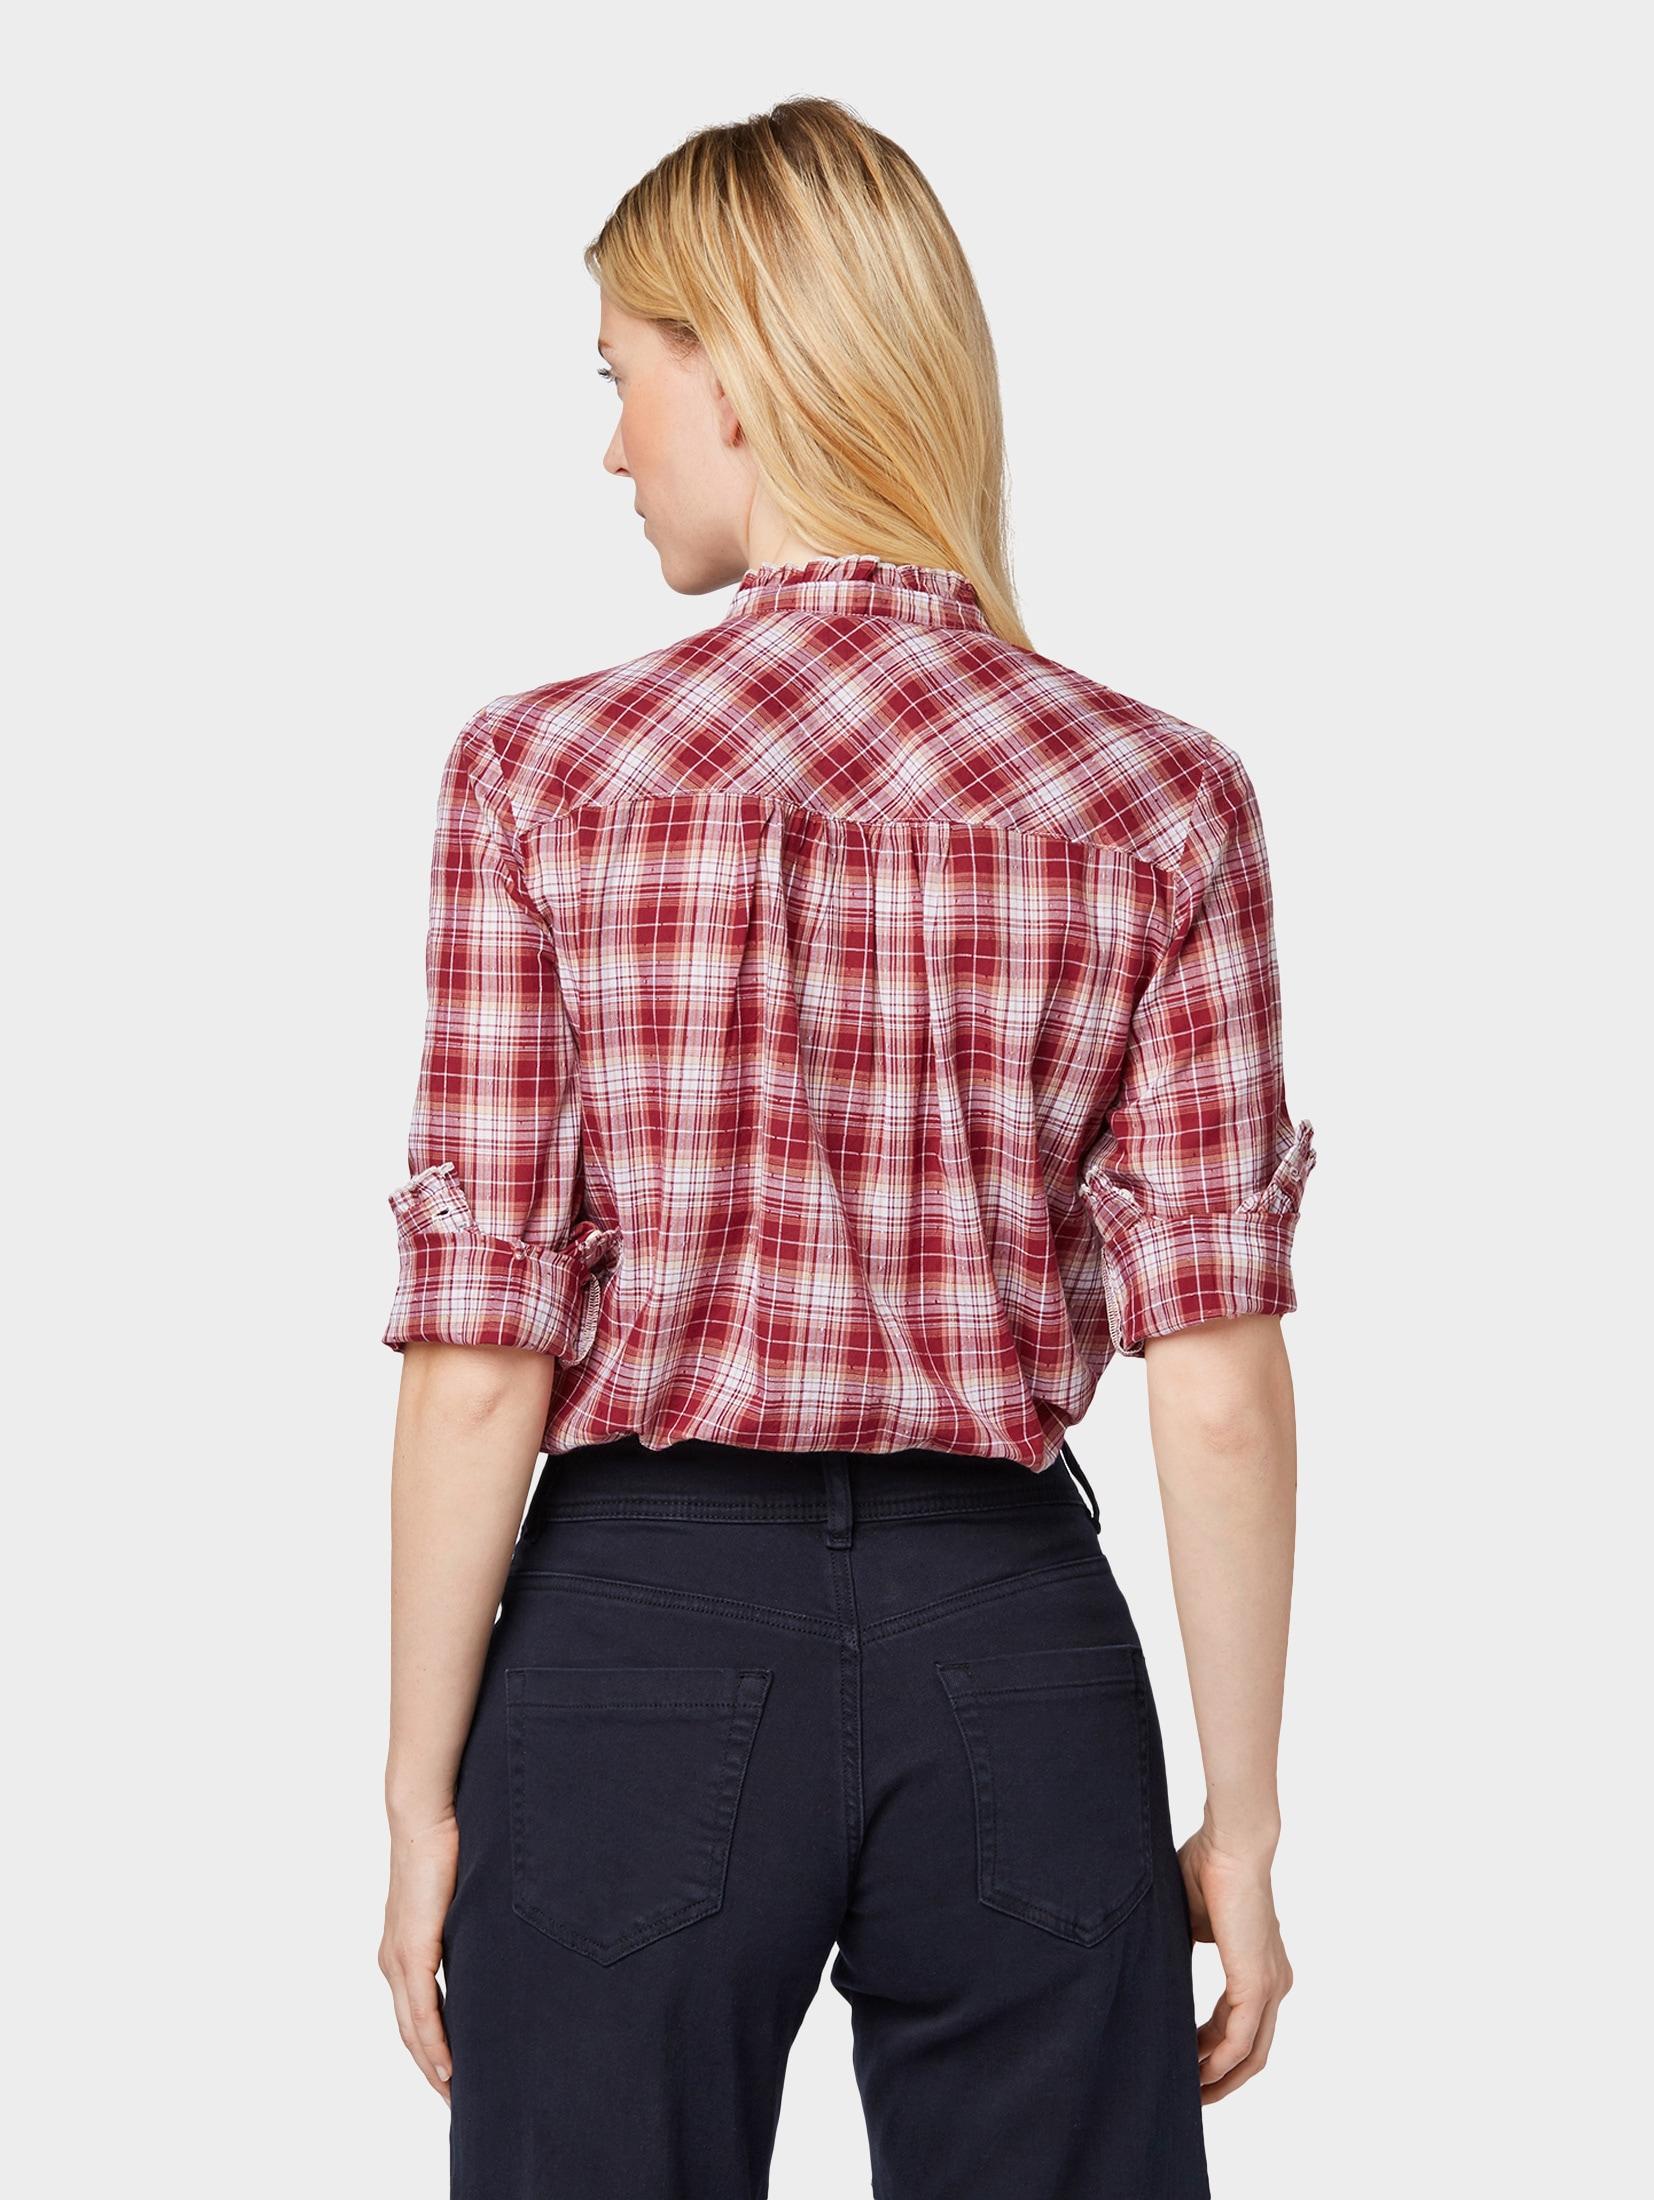 TOM TAILOR Hemdbluse Bluse mit strukturiertem Karomuster